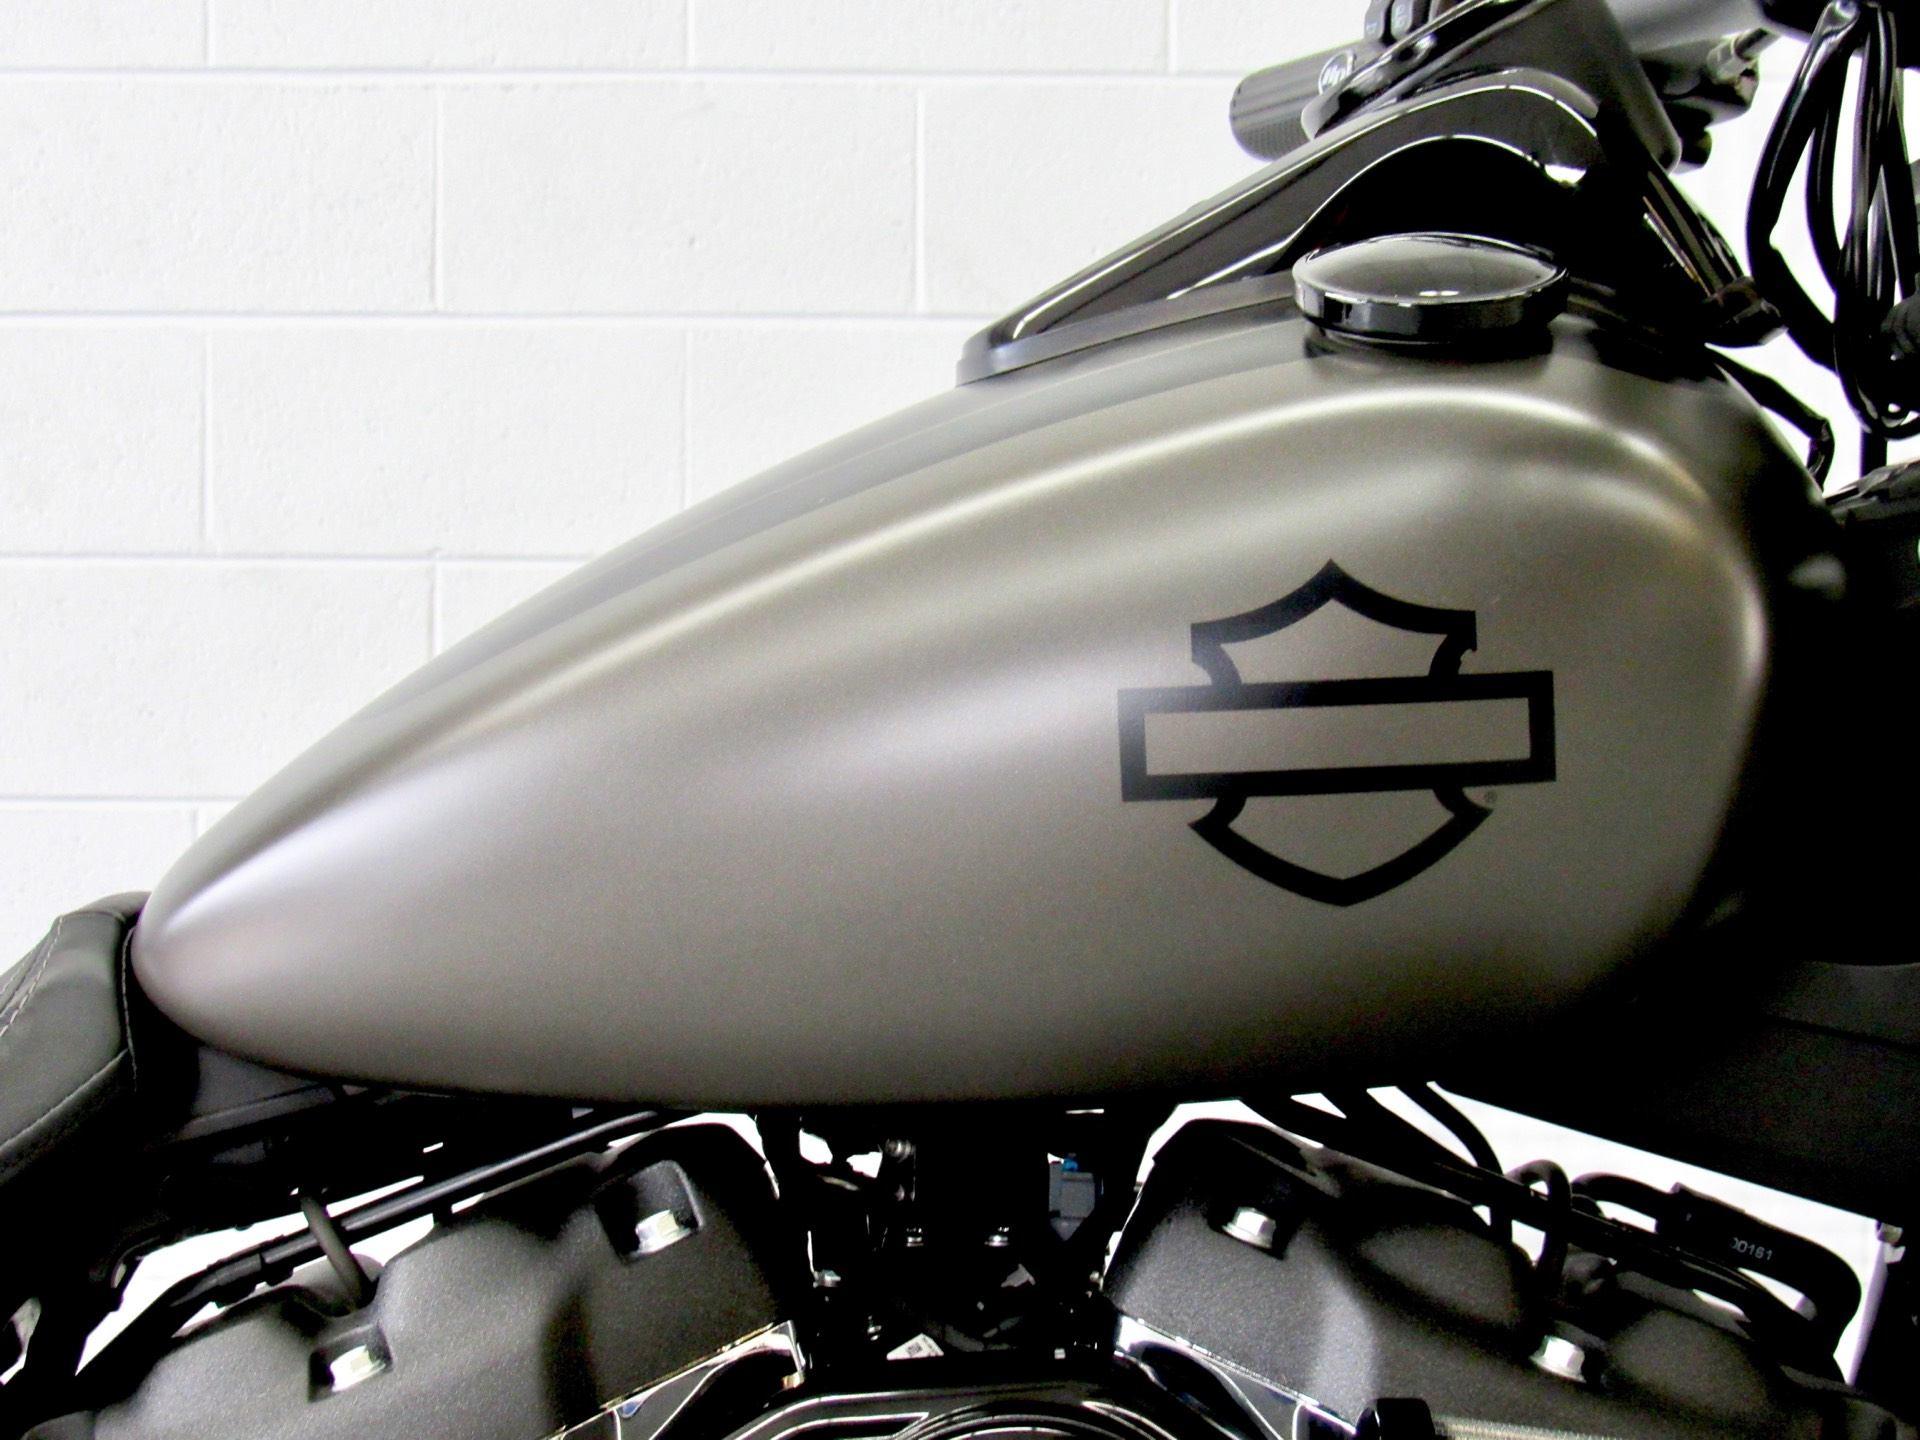 2018 Harley-Davidson Fat Bob® 107 in Fredericksburg, Virginia